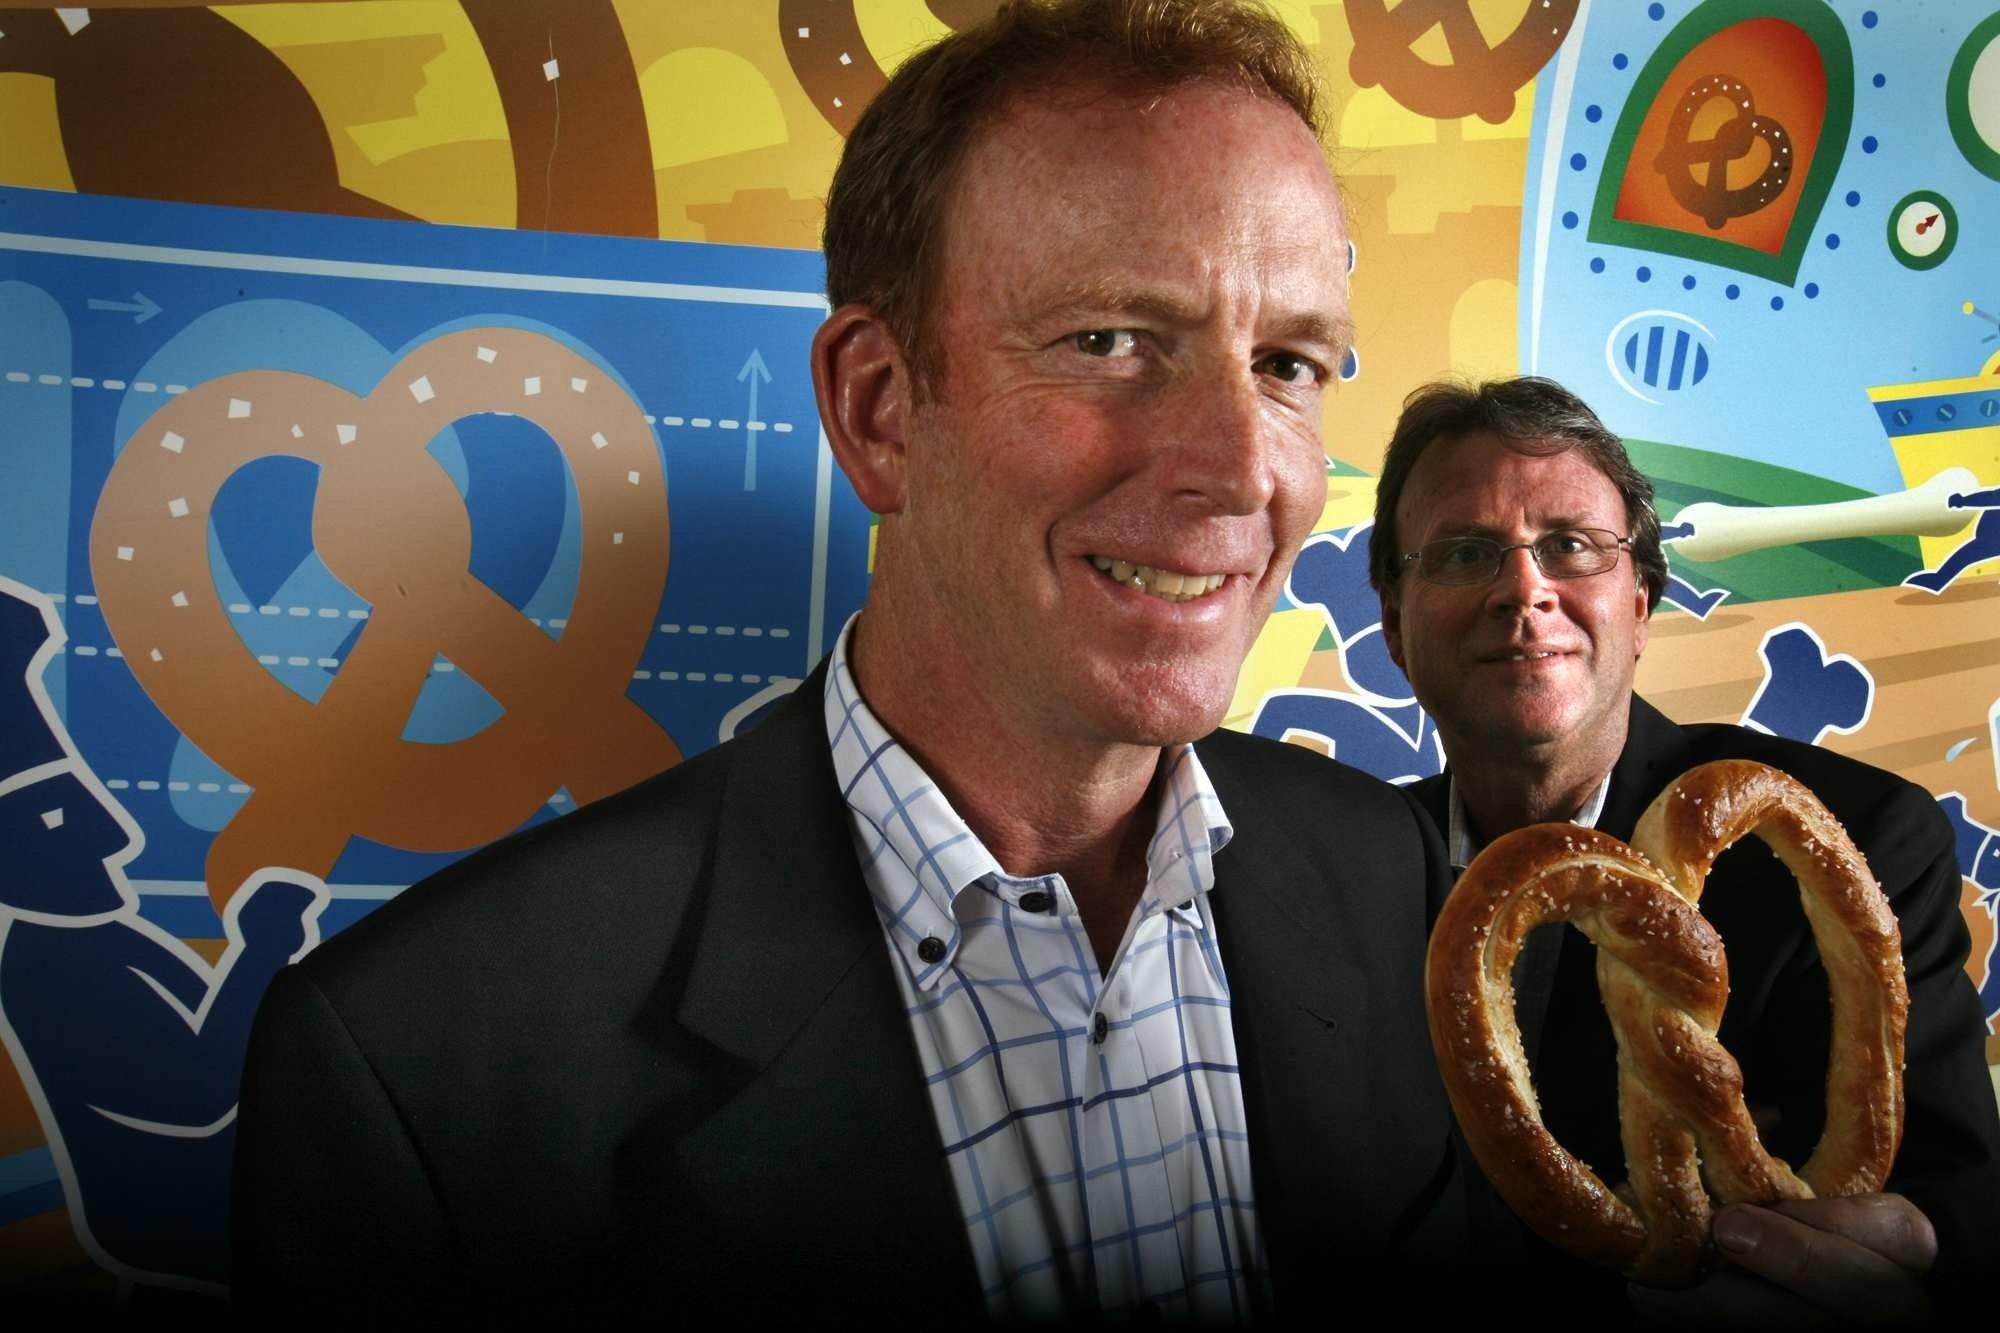 PASADENA, CA- OCTOBER 05, 2012: Bill Phelps and Rick Wetzel, the co-founders of the Wetzel's Pretzel